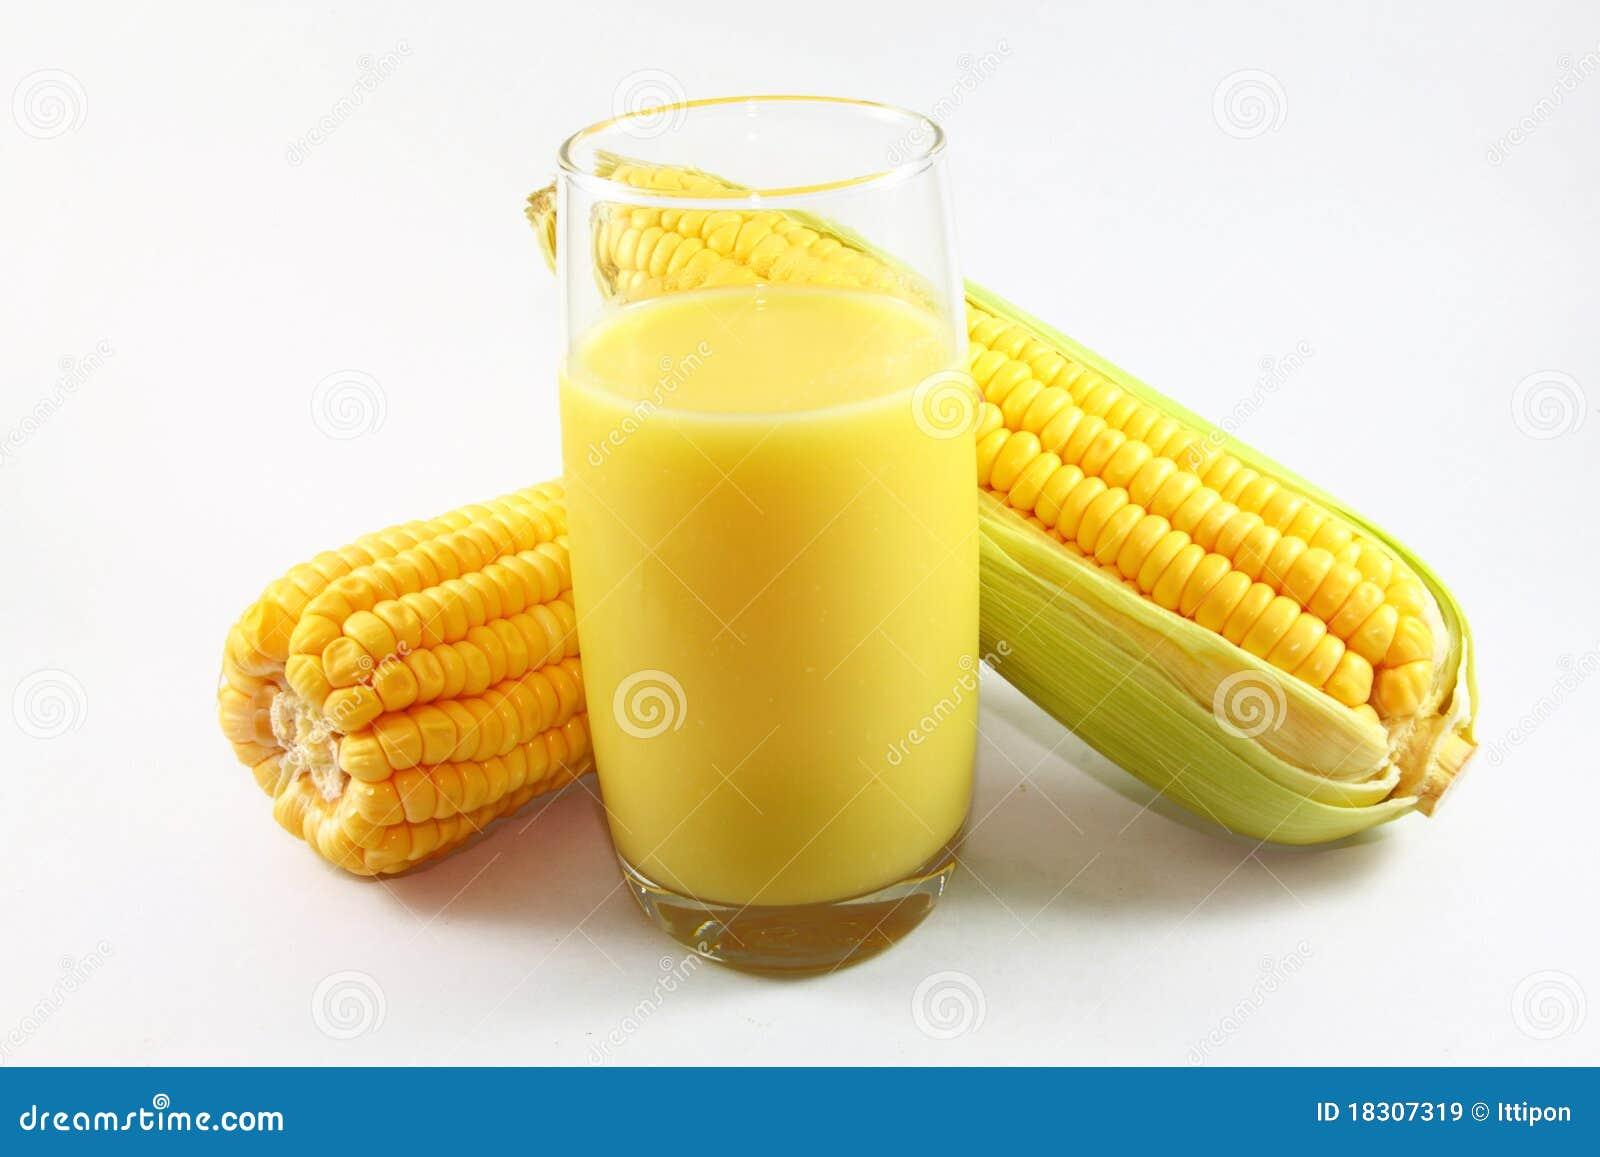 How To Make Corn Juice